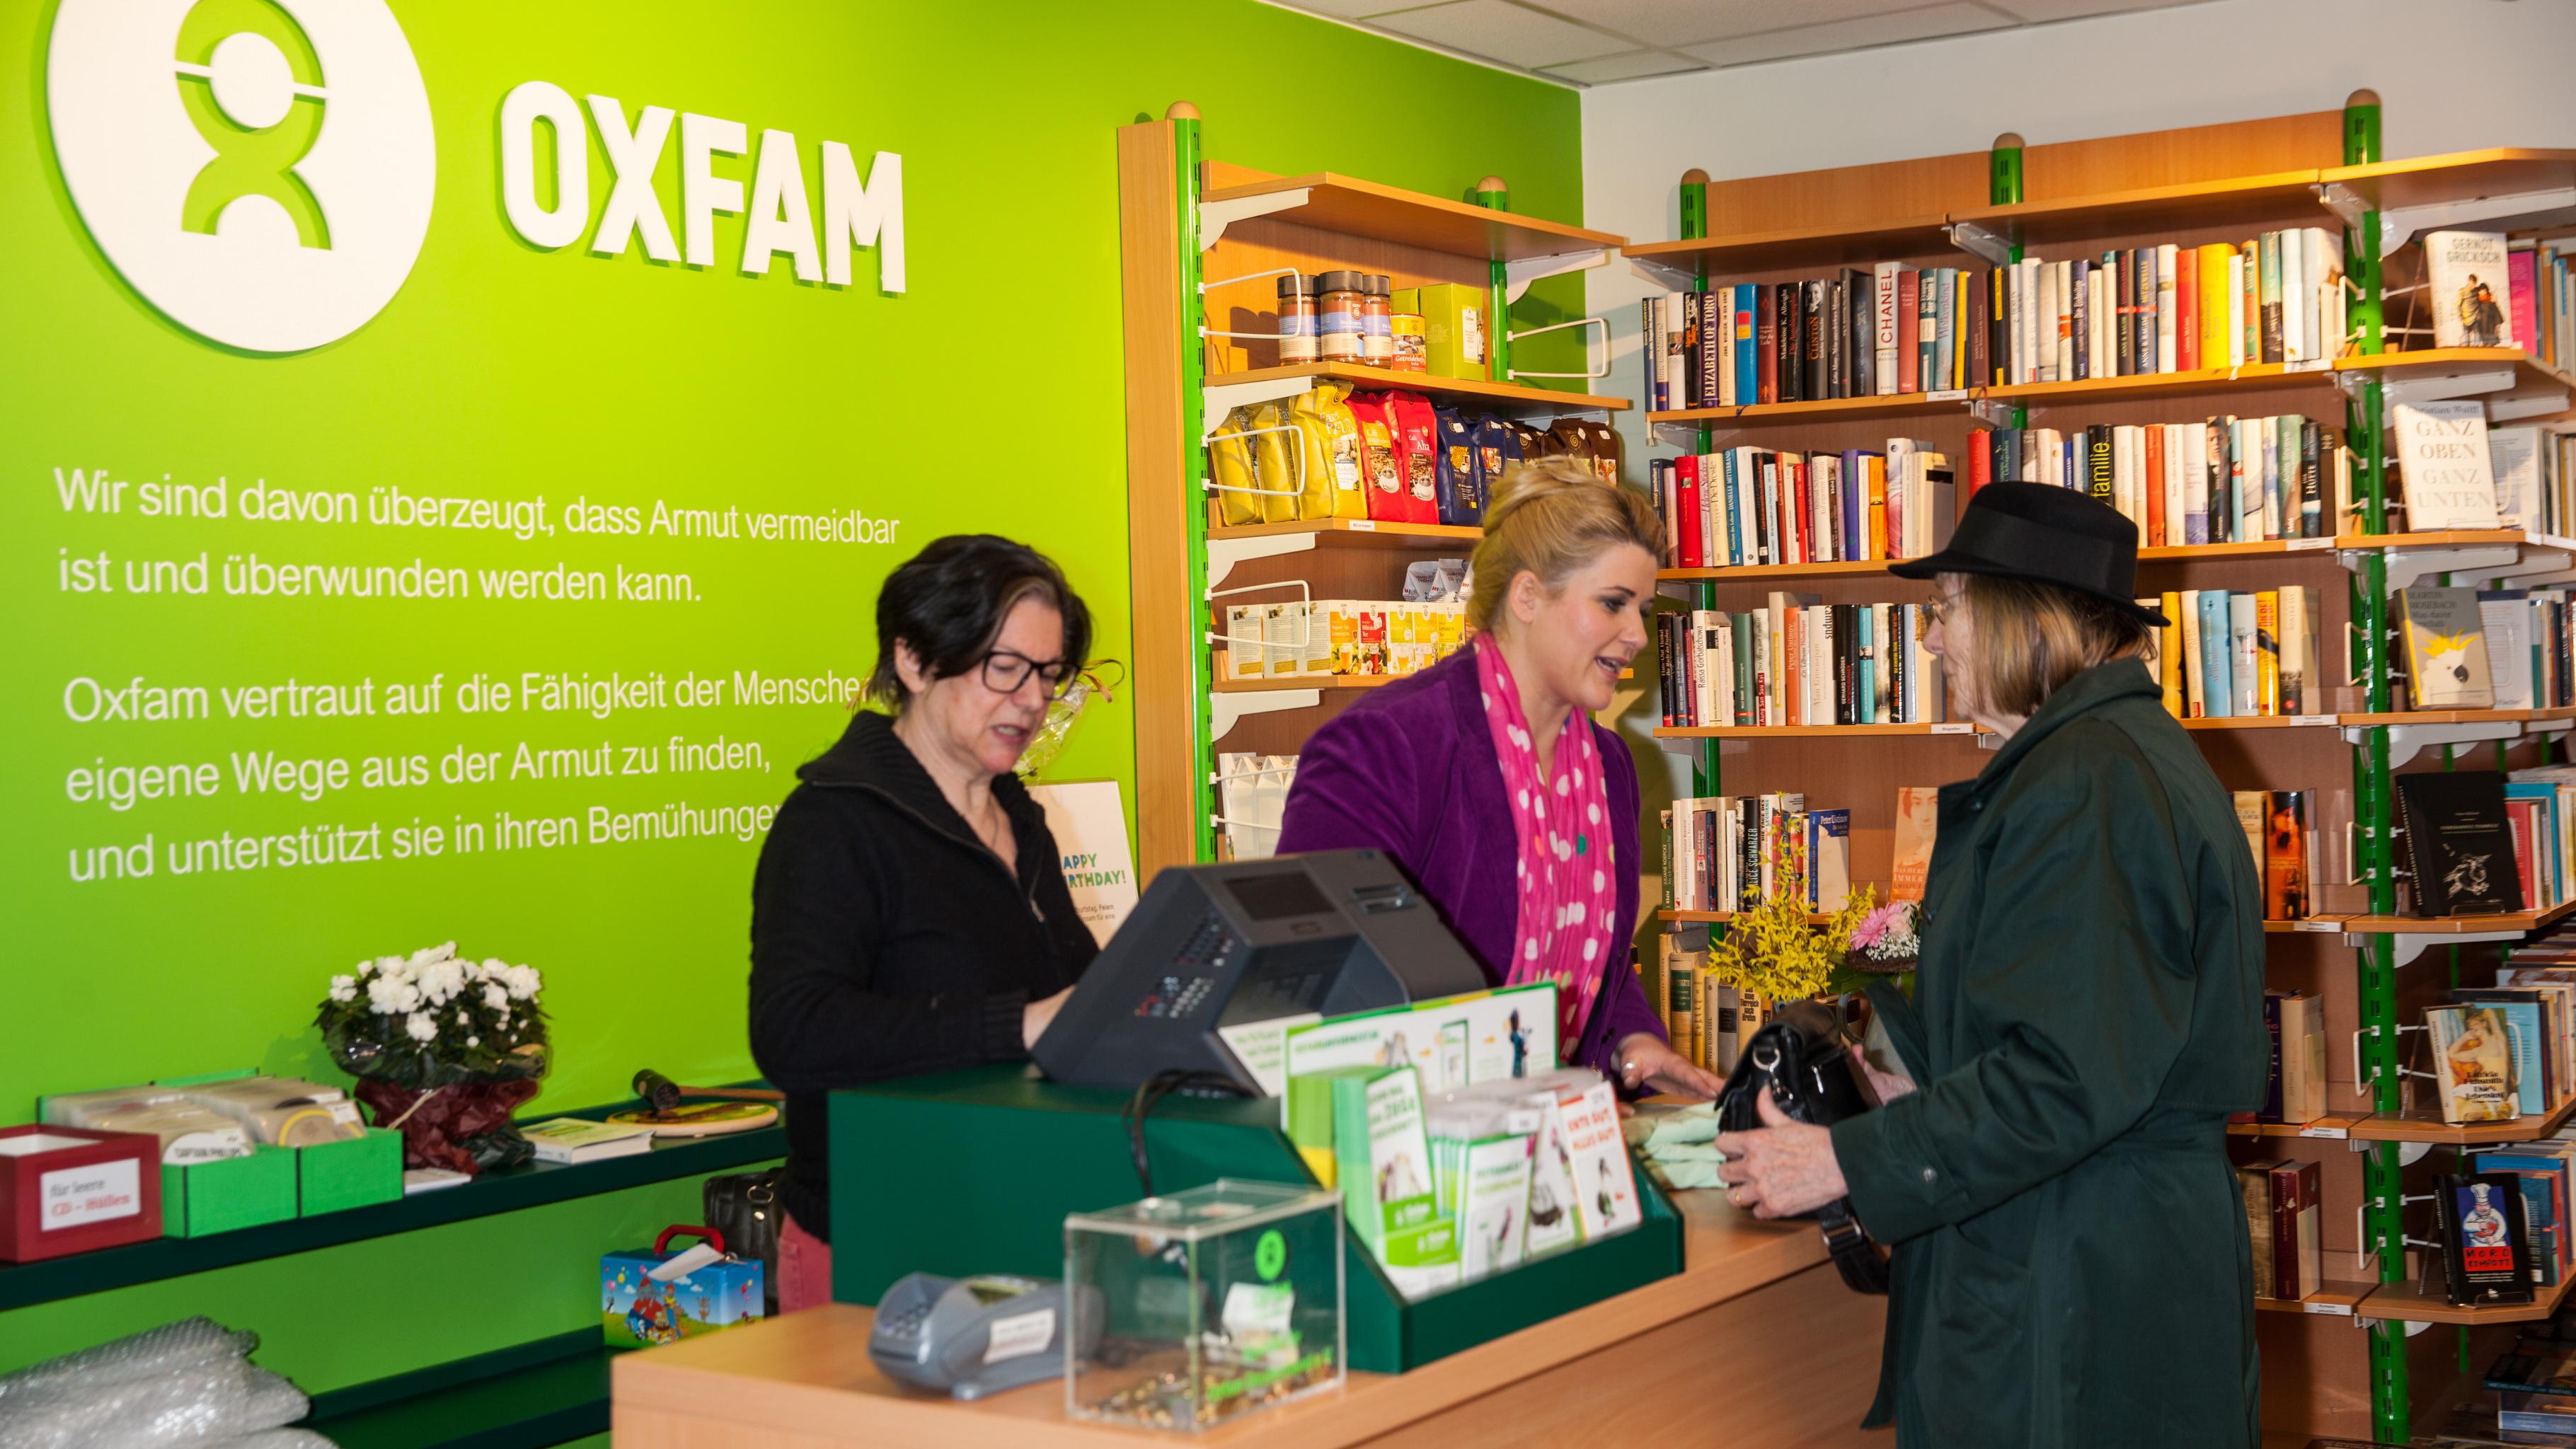 Oxfam Shop Hamburg-Hoheluft - Anke Harnack packt mit an